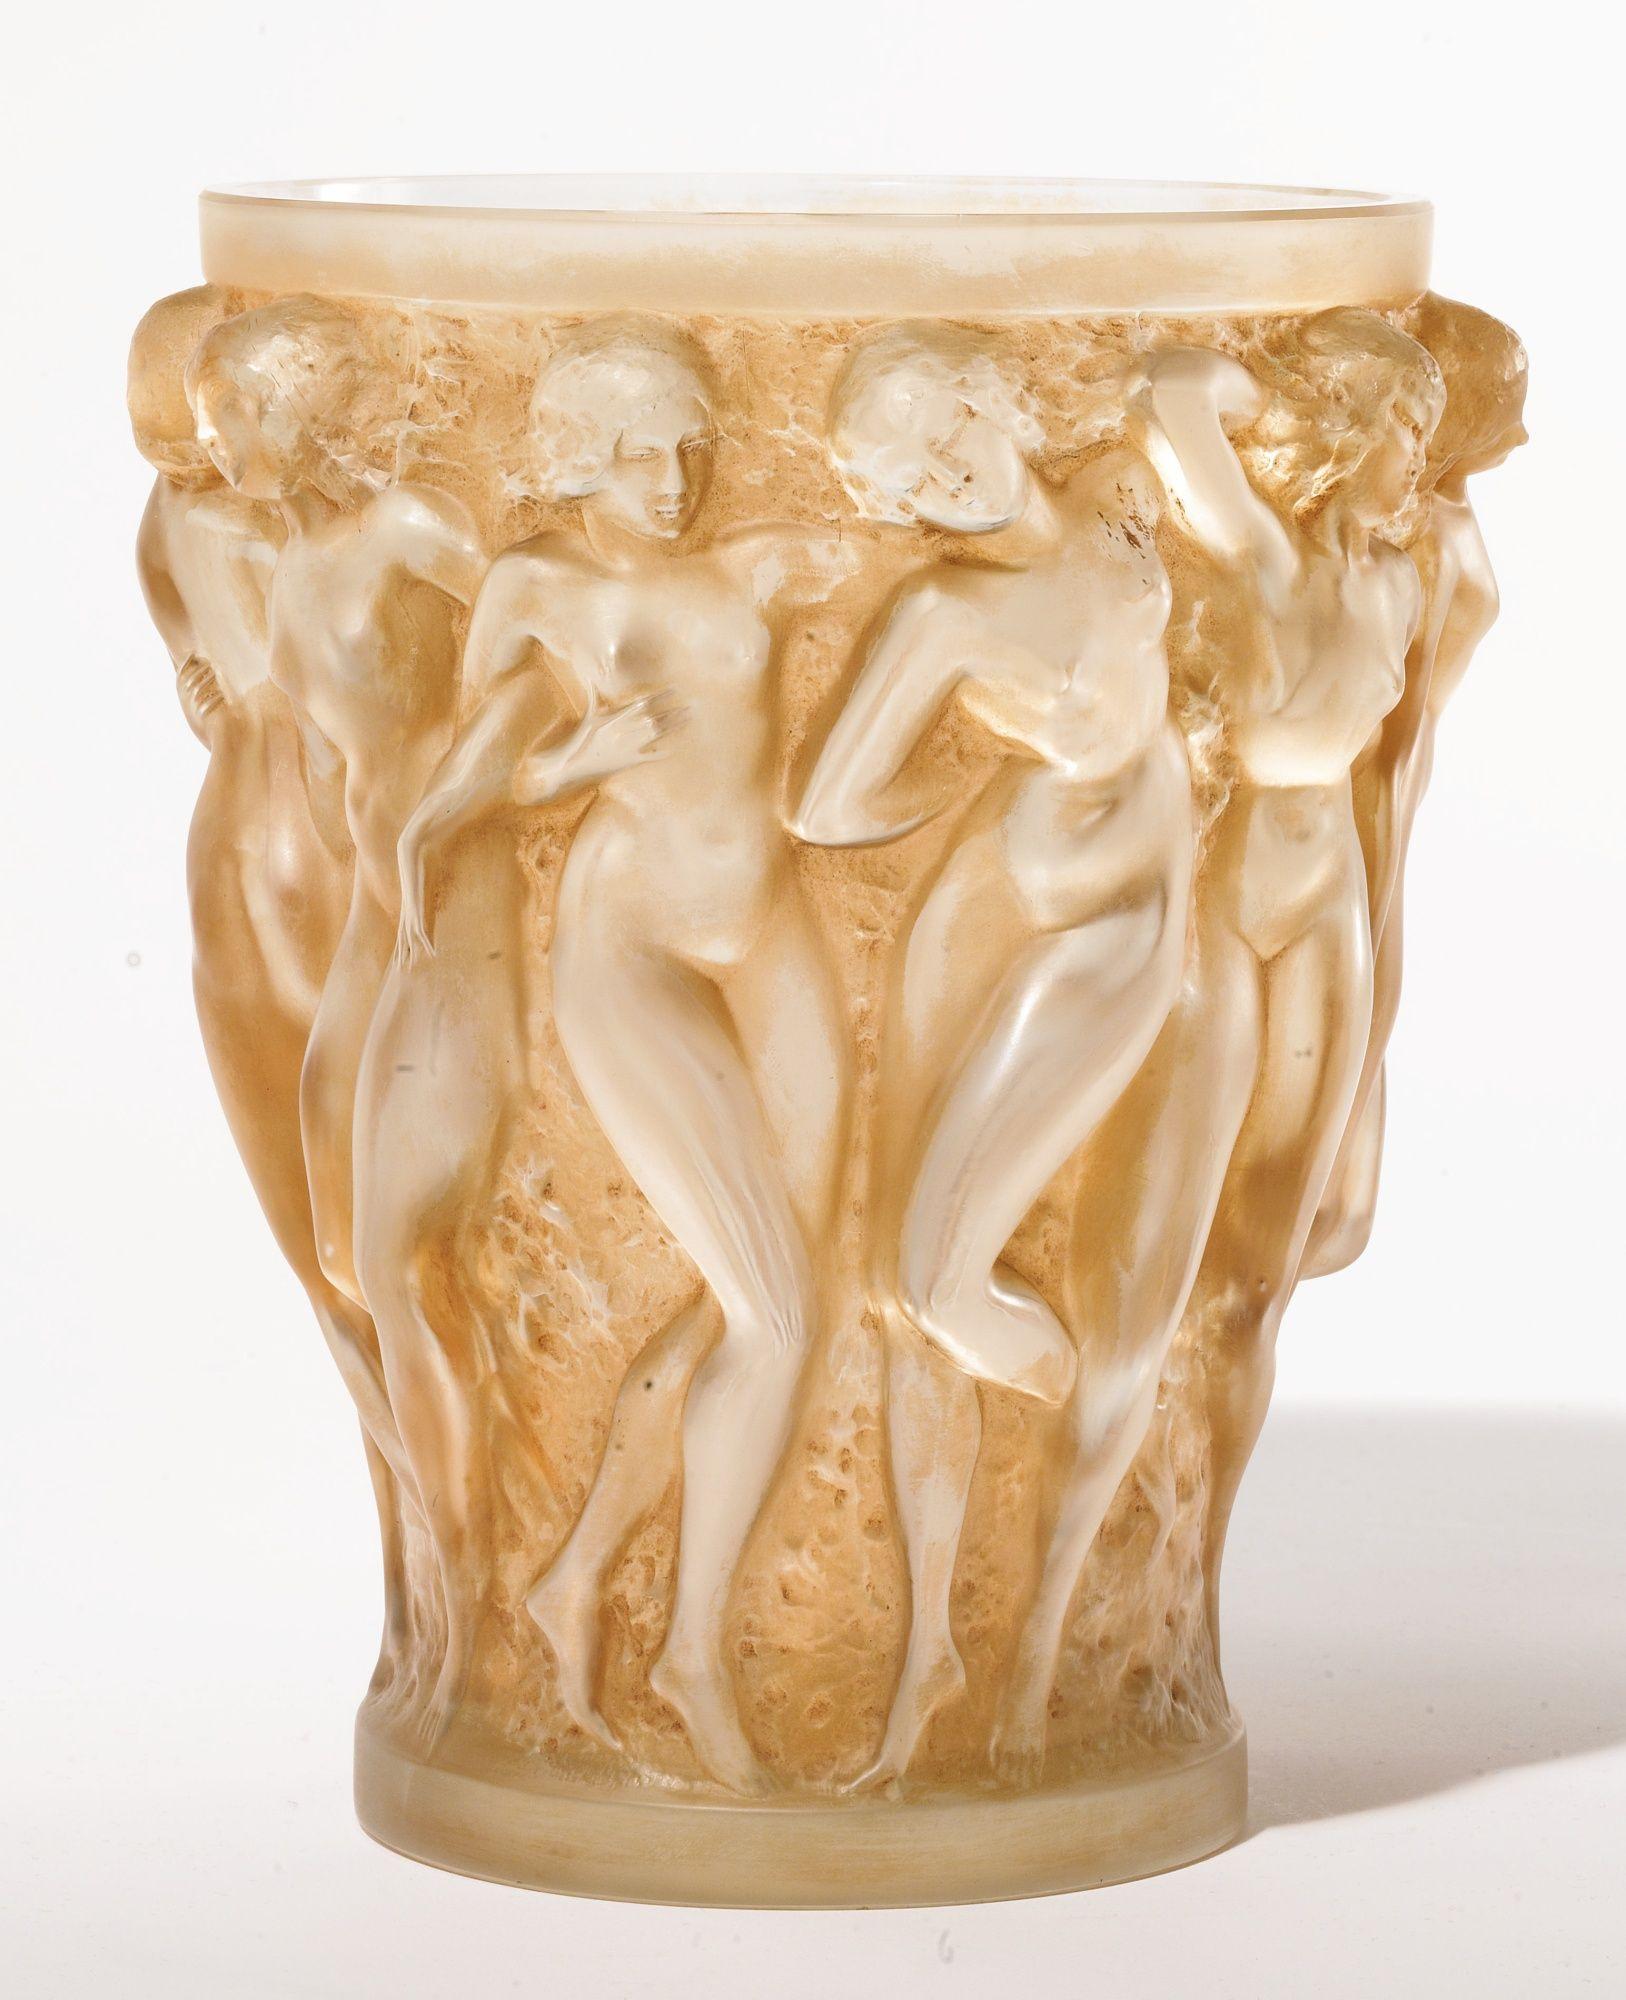 lalique glass vase of 0997 rena lalique bacchantes vase marcilhac no 997 engraved r throughout 0997 rena lalique bacchantes vase marcilhac no 997 engraved r lalique